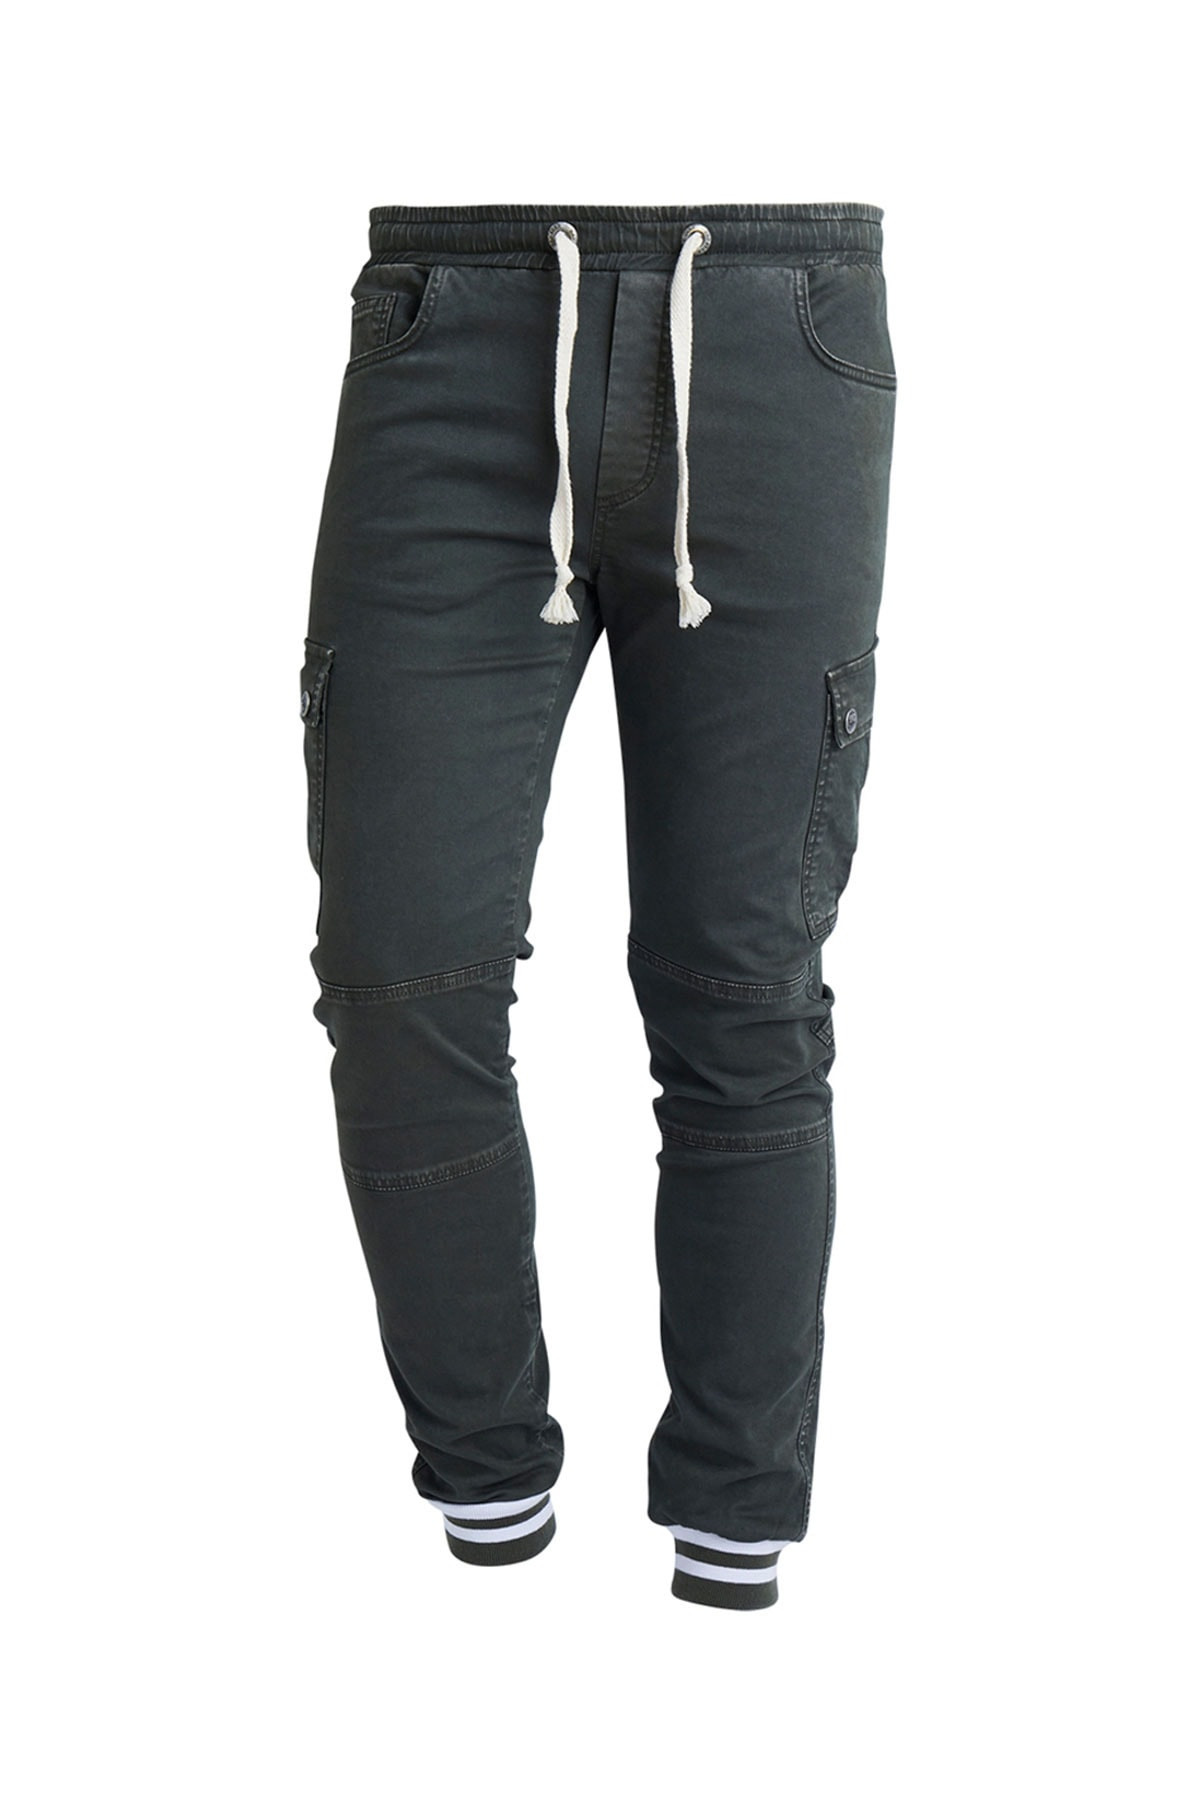 Bad Bear Haki Erkek Pantolon OREGON PANT KHAKI 1